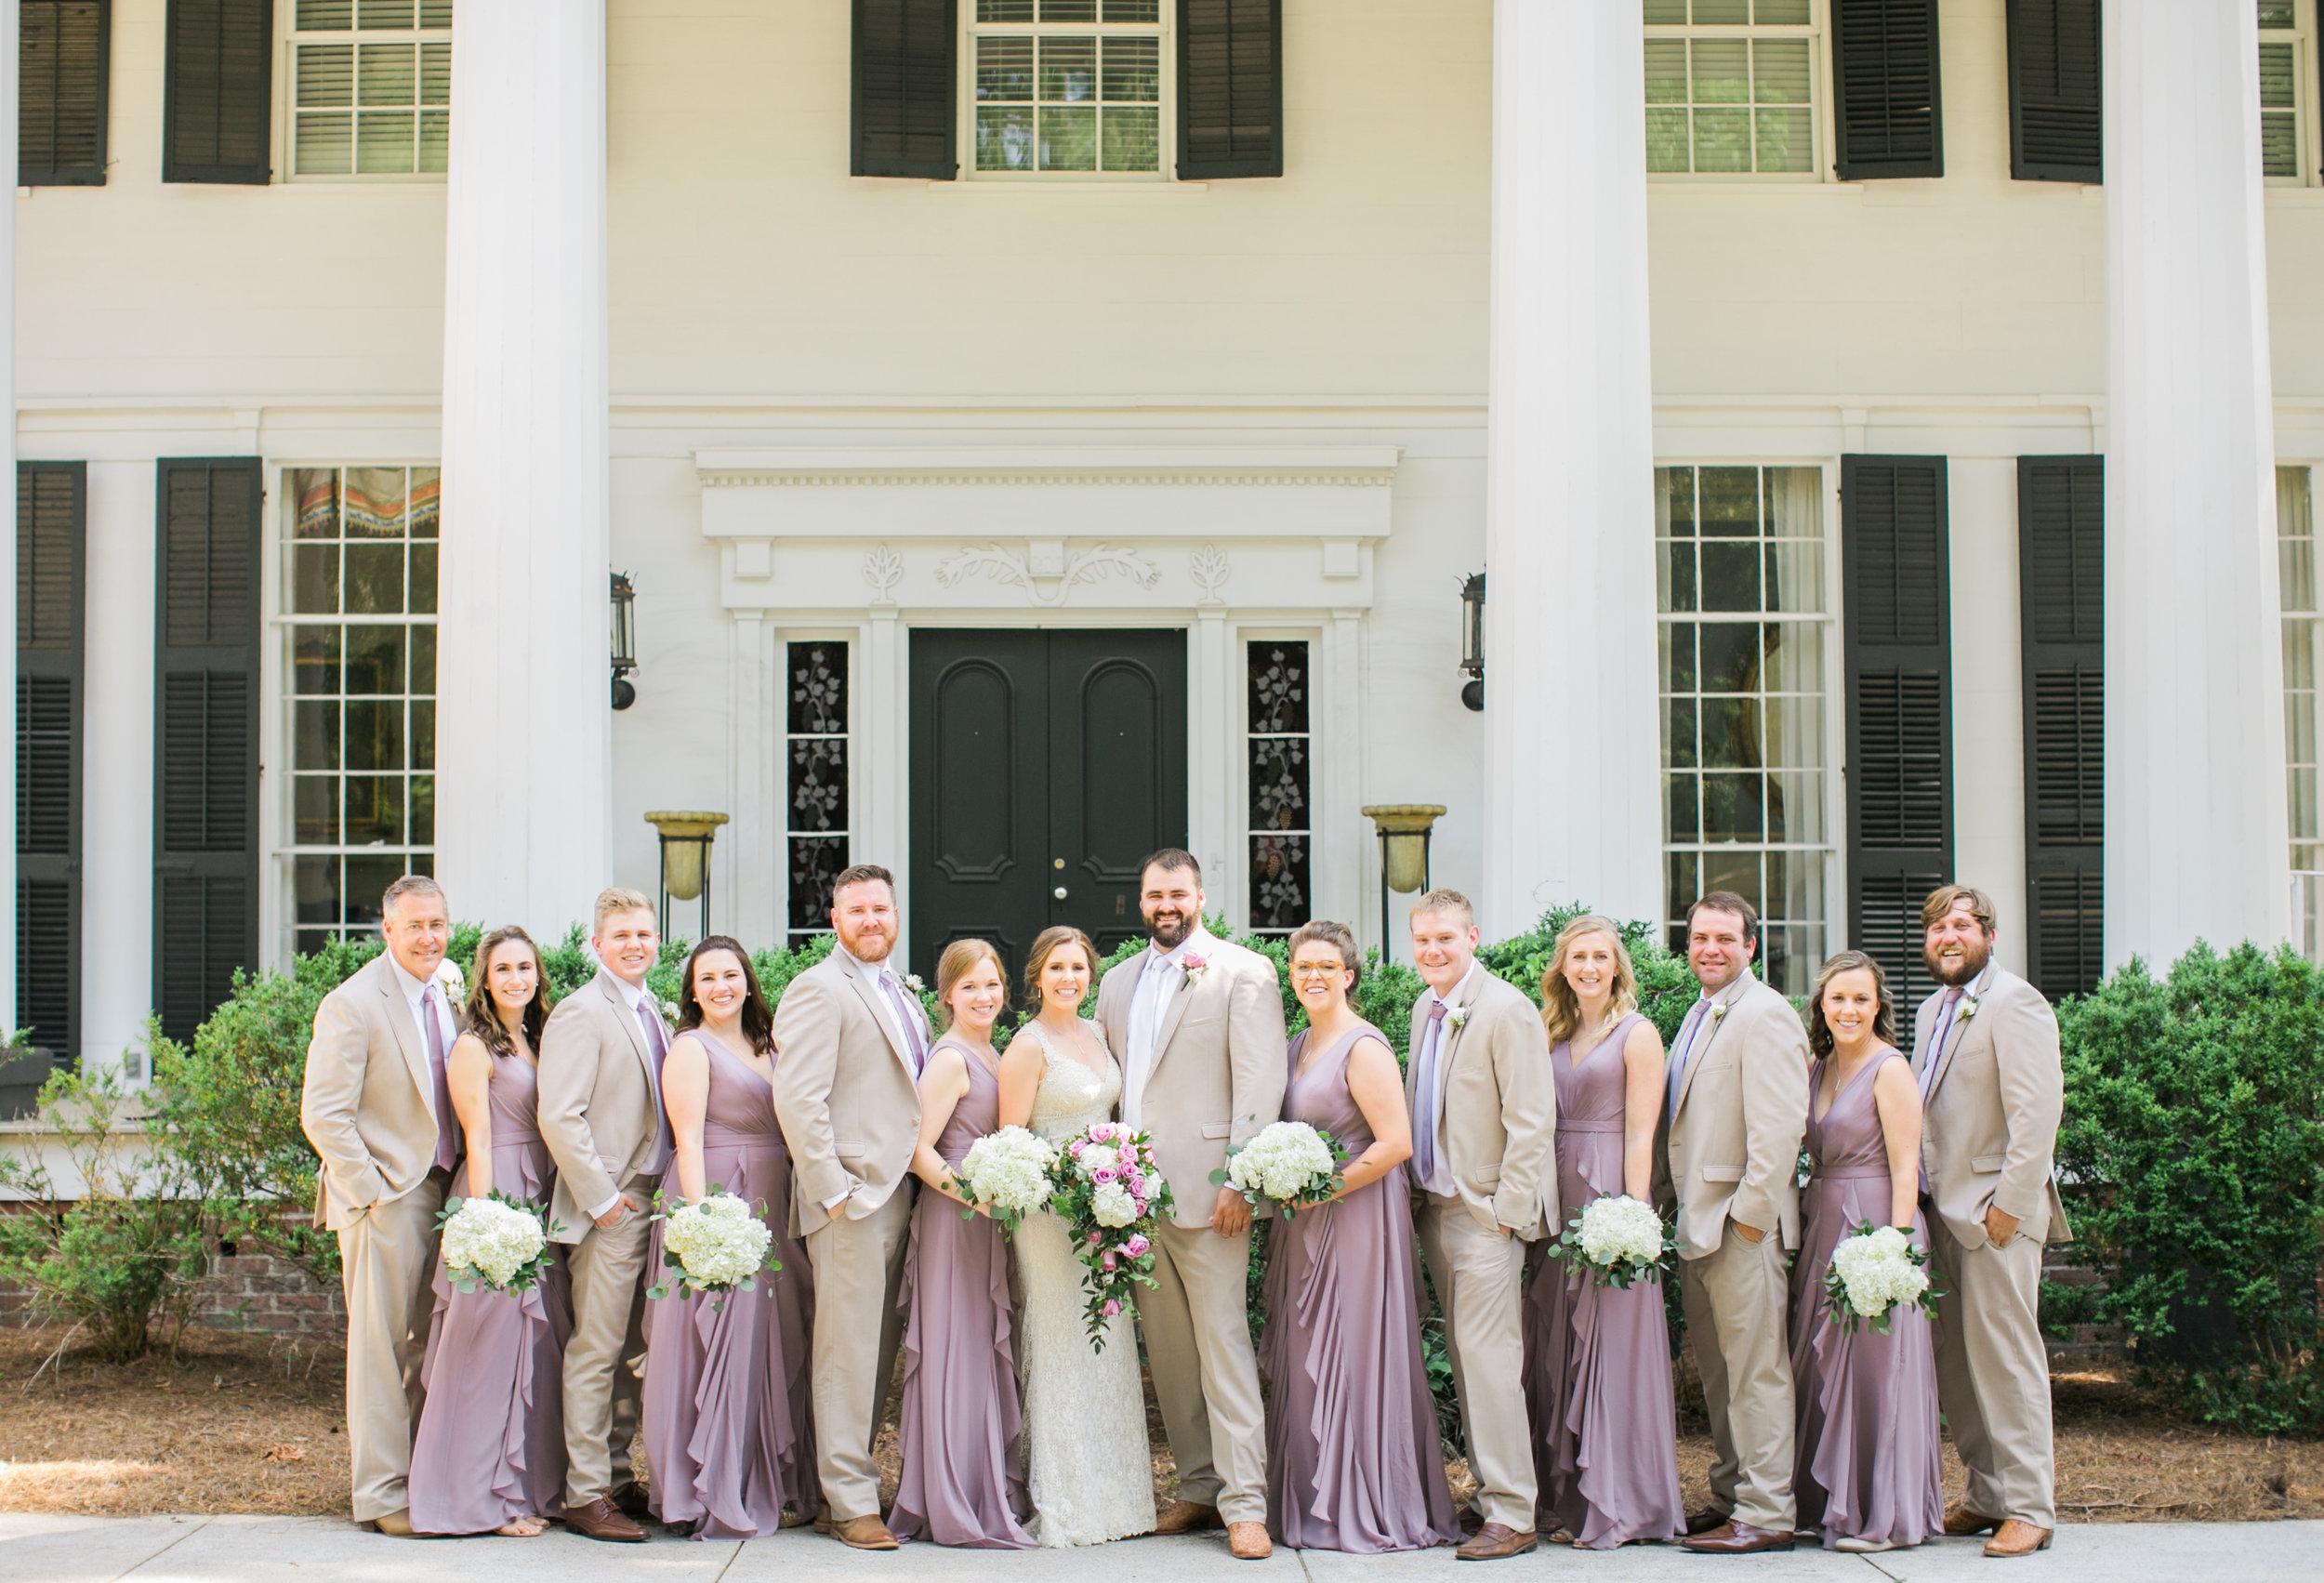 WatkinsvilleGeorgia wedding photographer